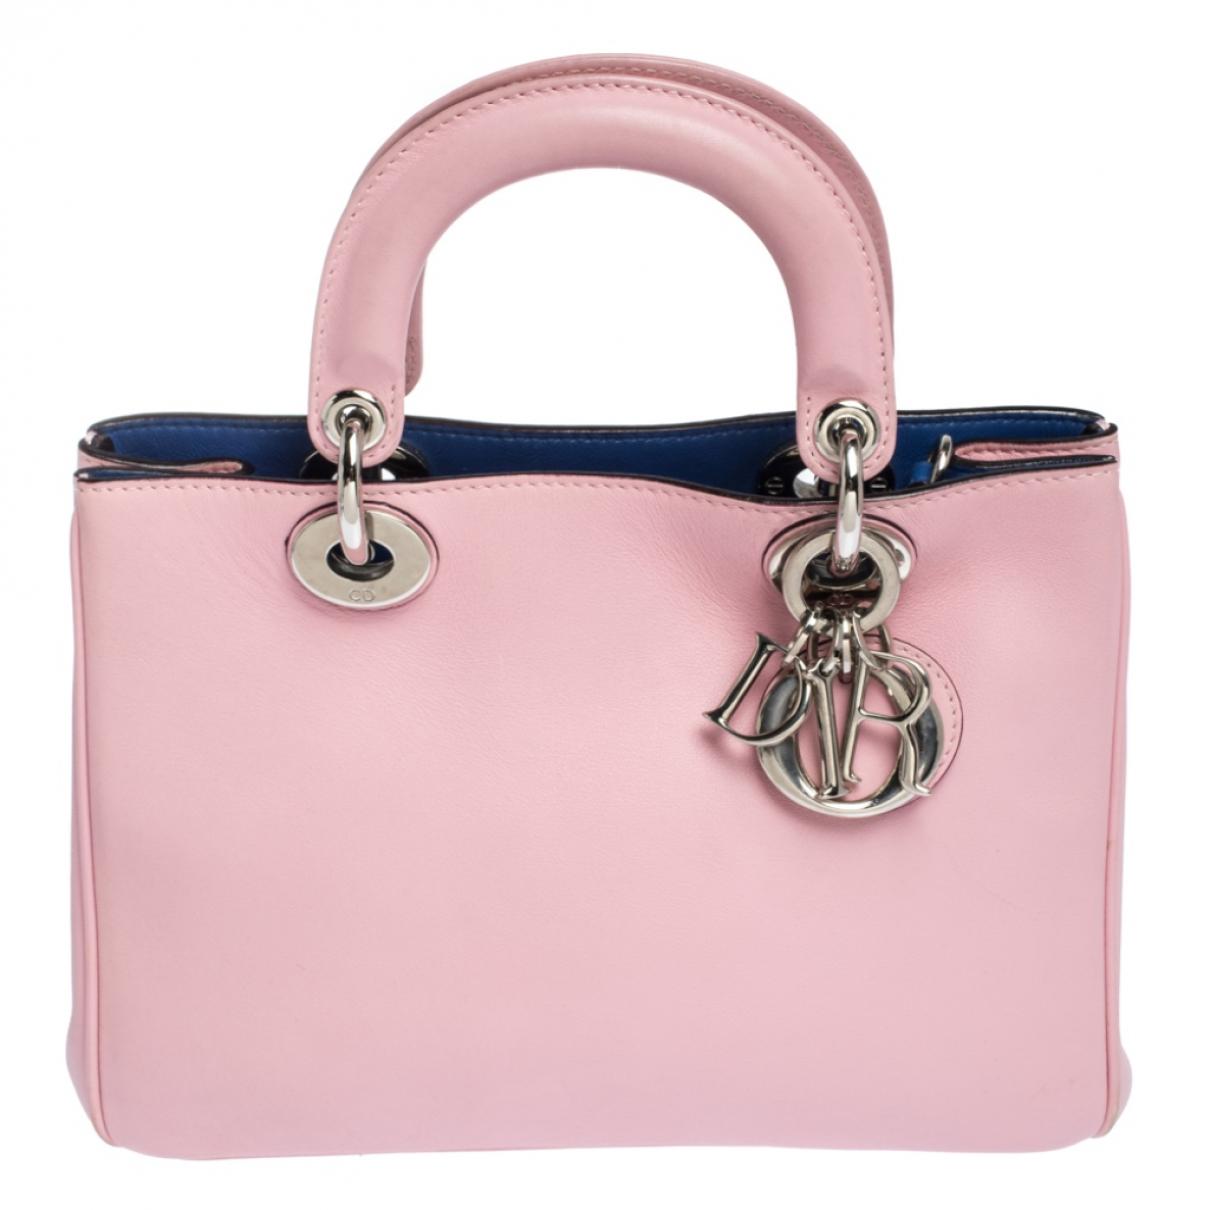 Dior Diorissimo Handtasche in  Rosa Leder